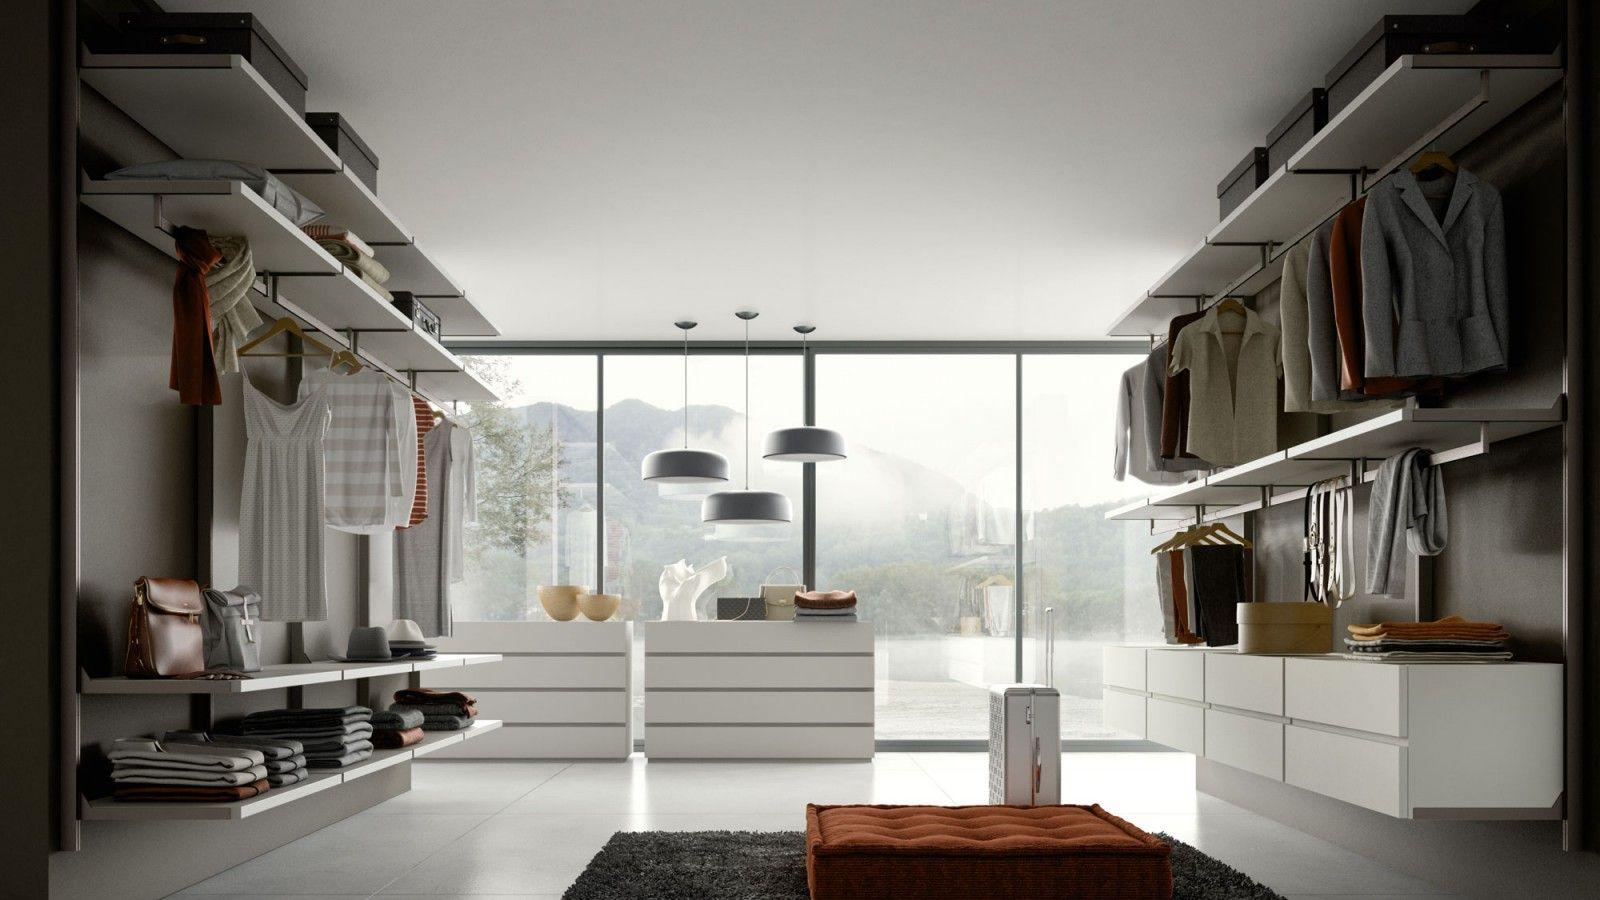 Mobili orme ~ Pin di mobilya arredamenti su orme design design